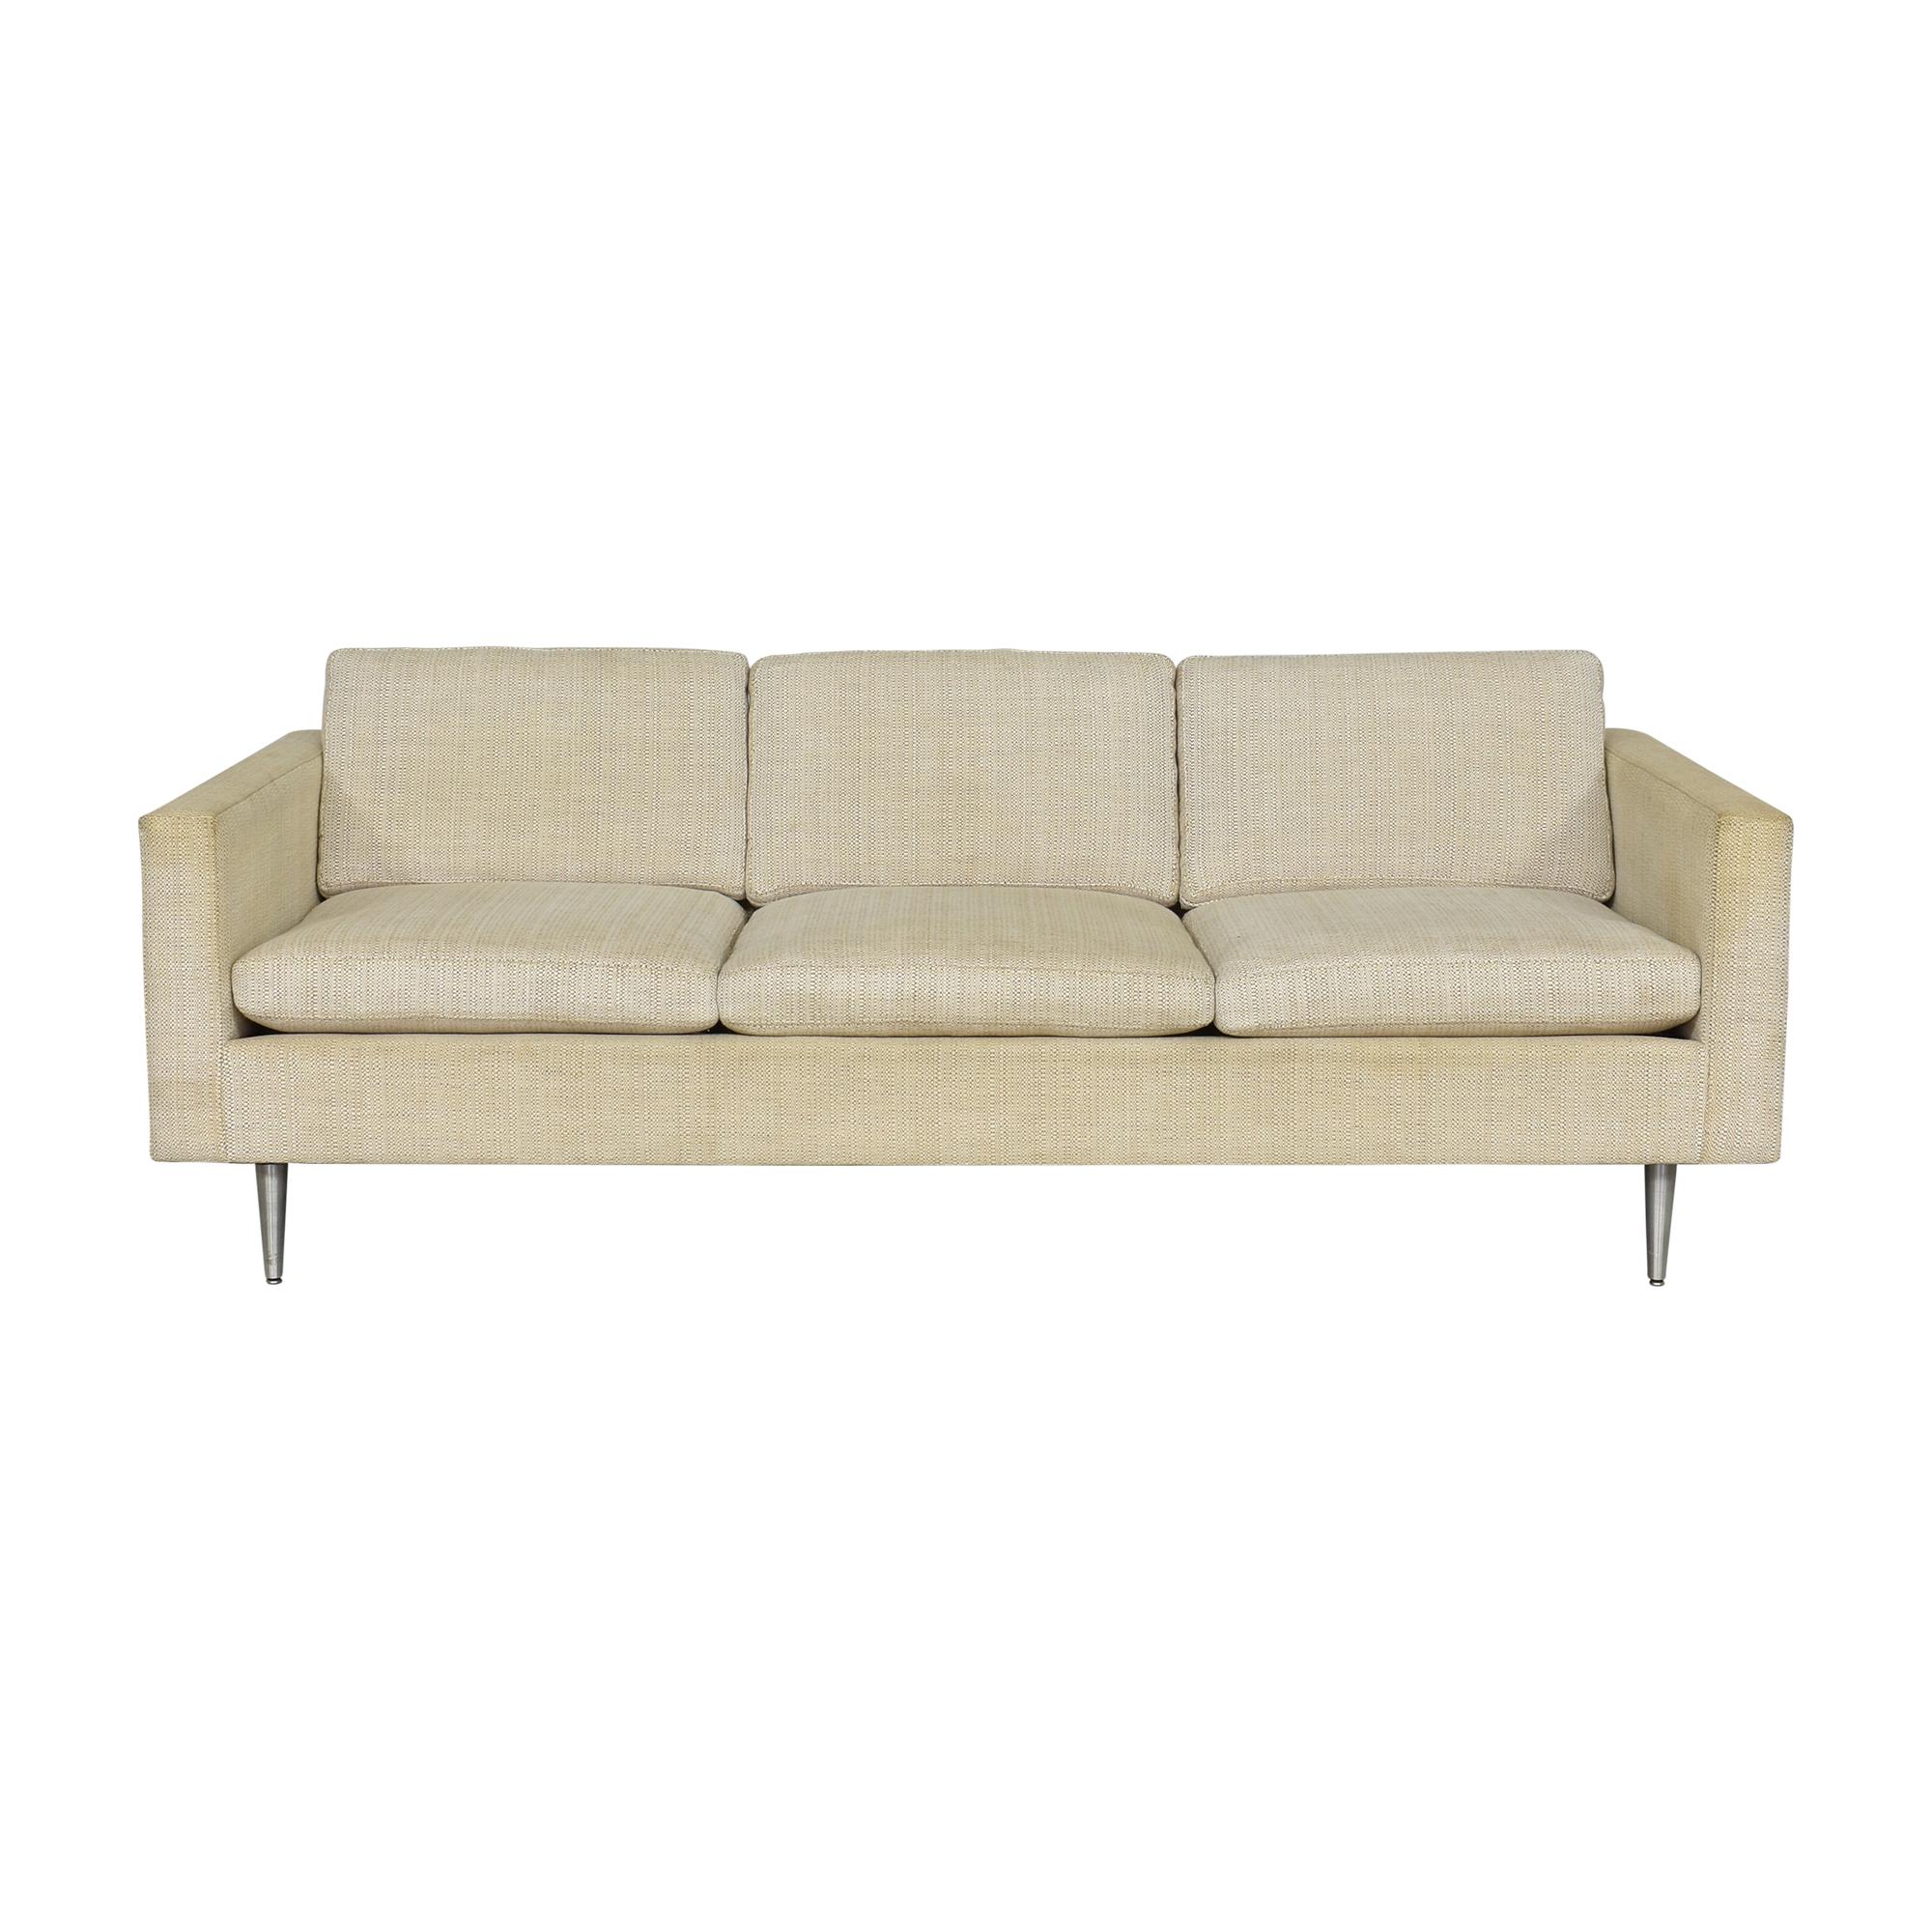 Mid-Century Modern Three Cushion Sofa on sale